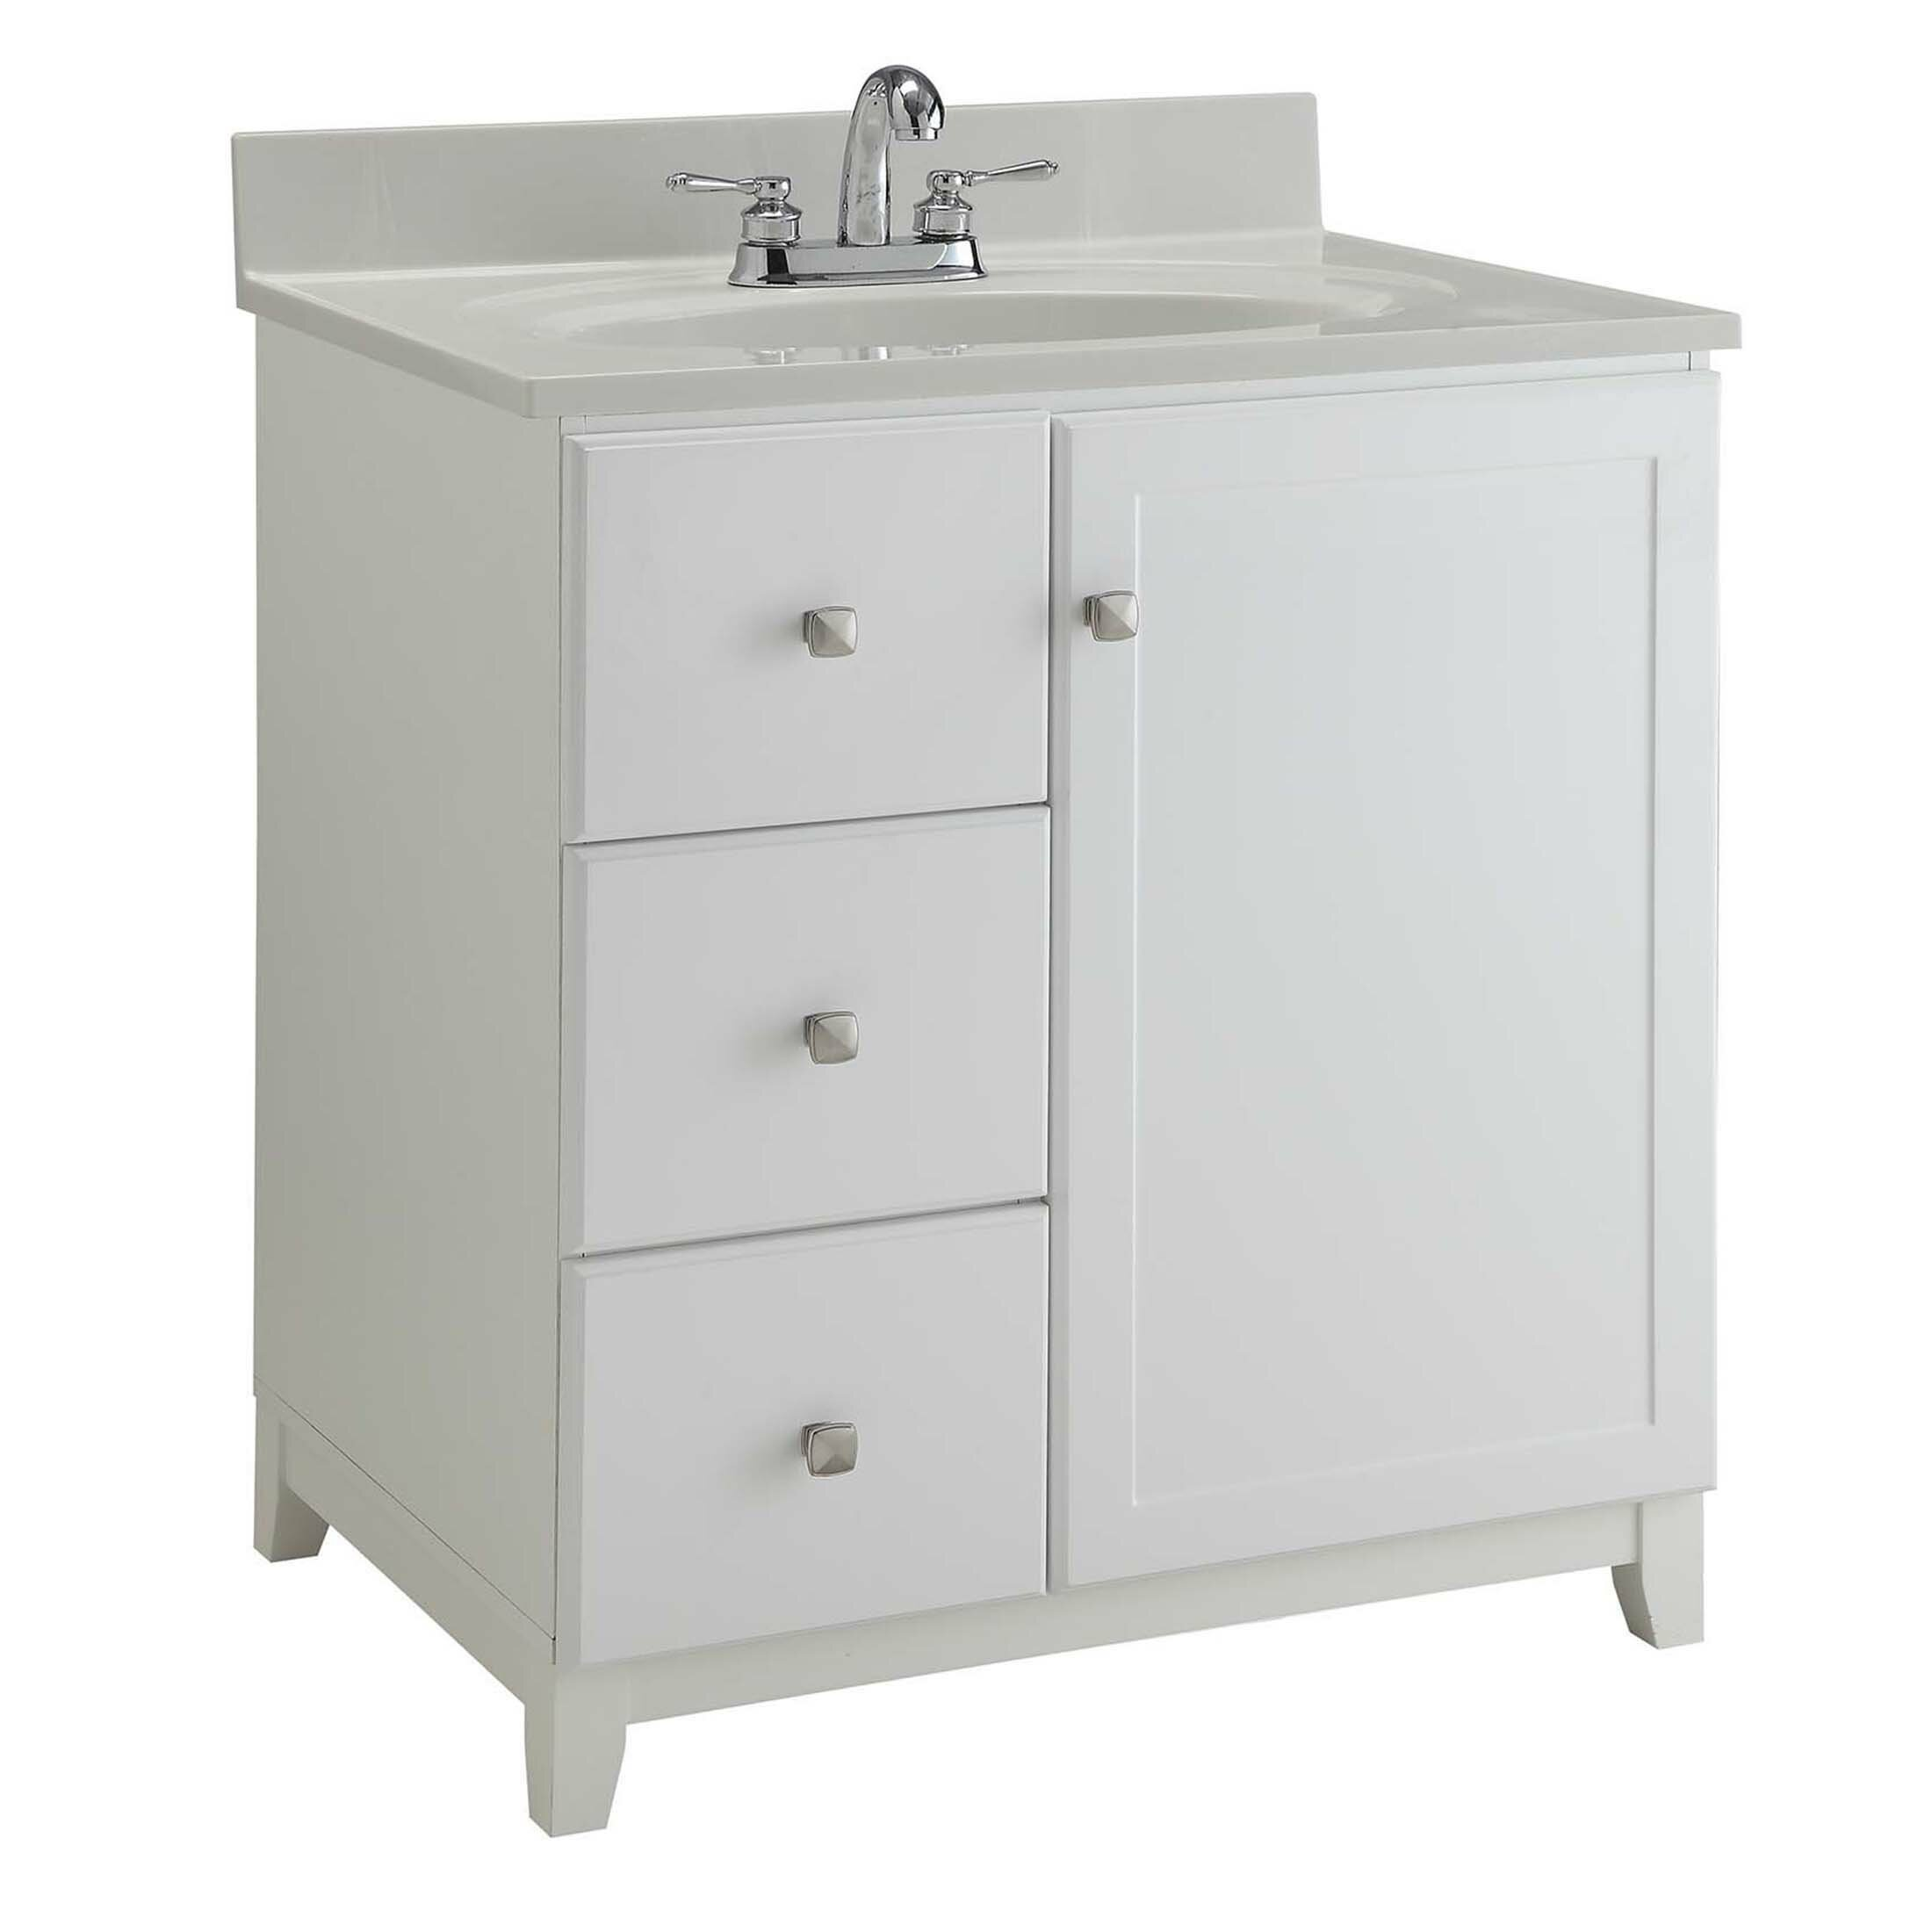 "Home Design Bathroom Vanity: Design House 40"" Single Bathroom Vanity Base & Reviews"